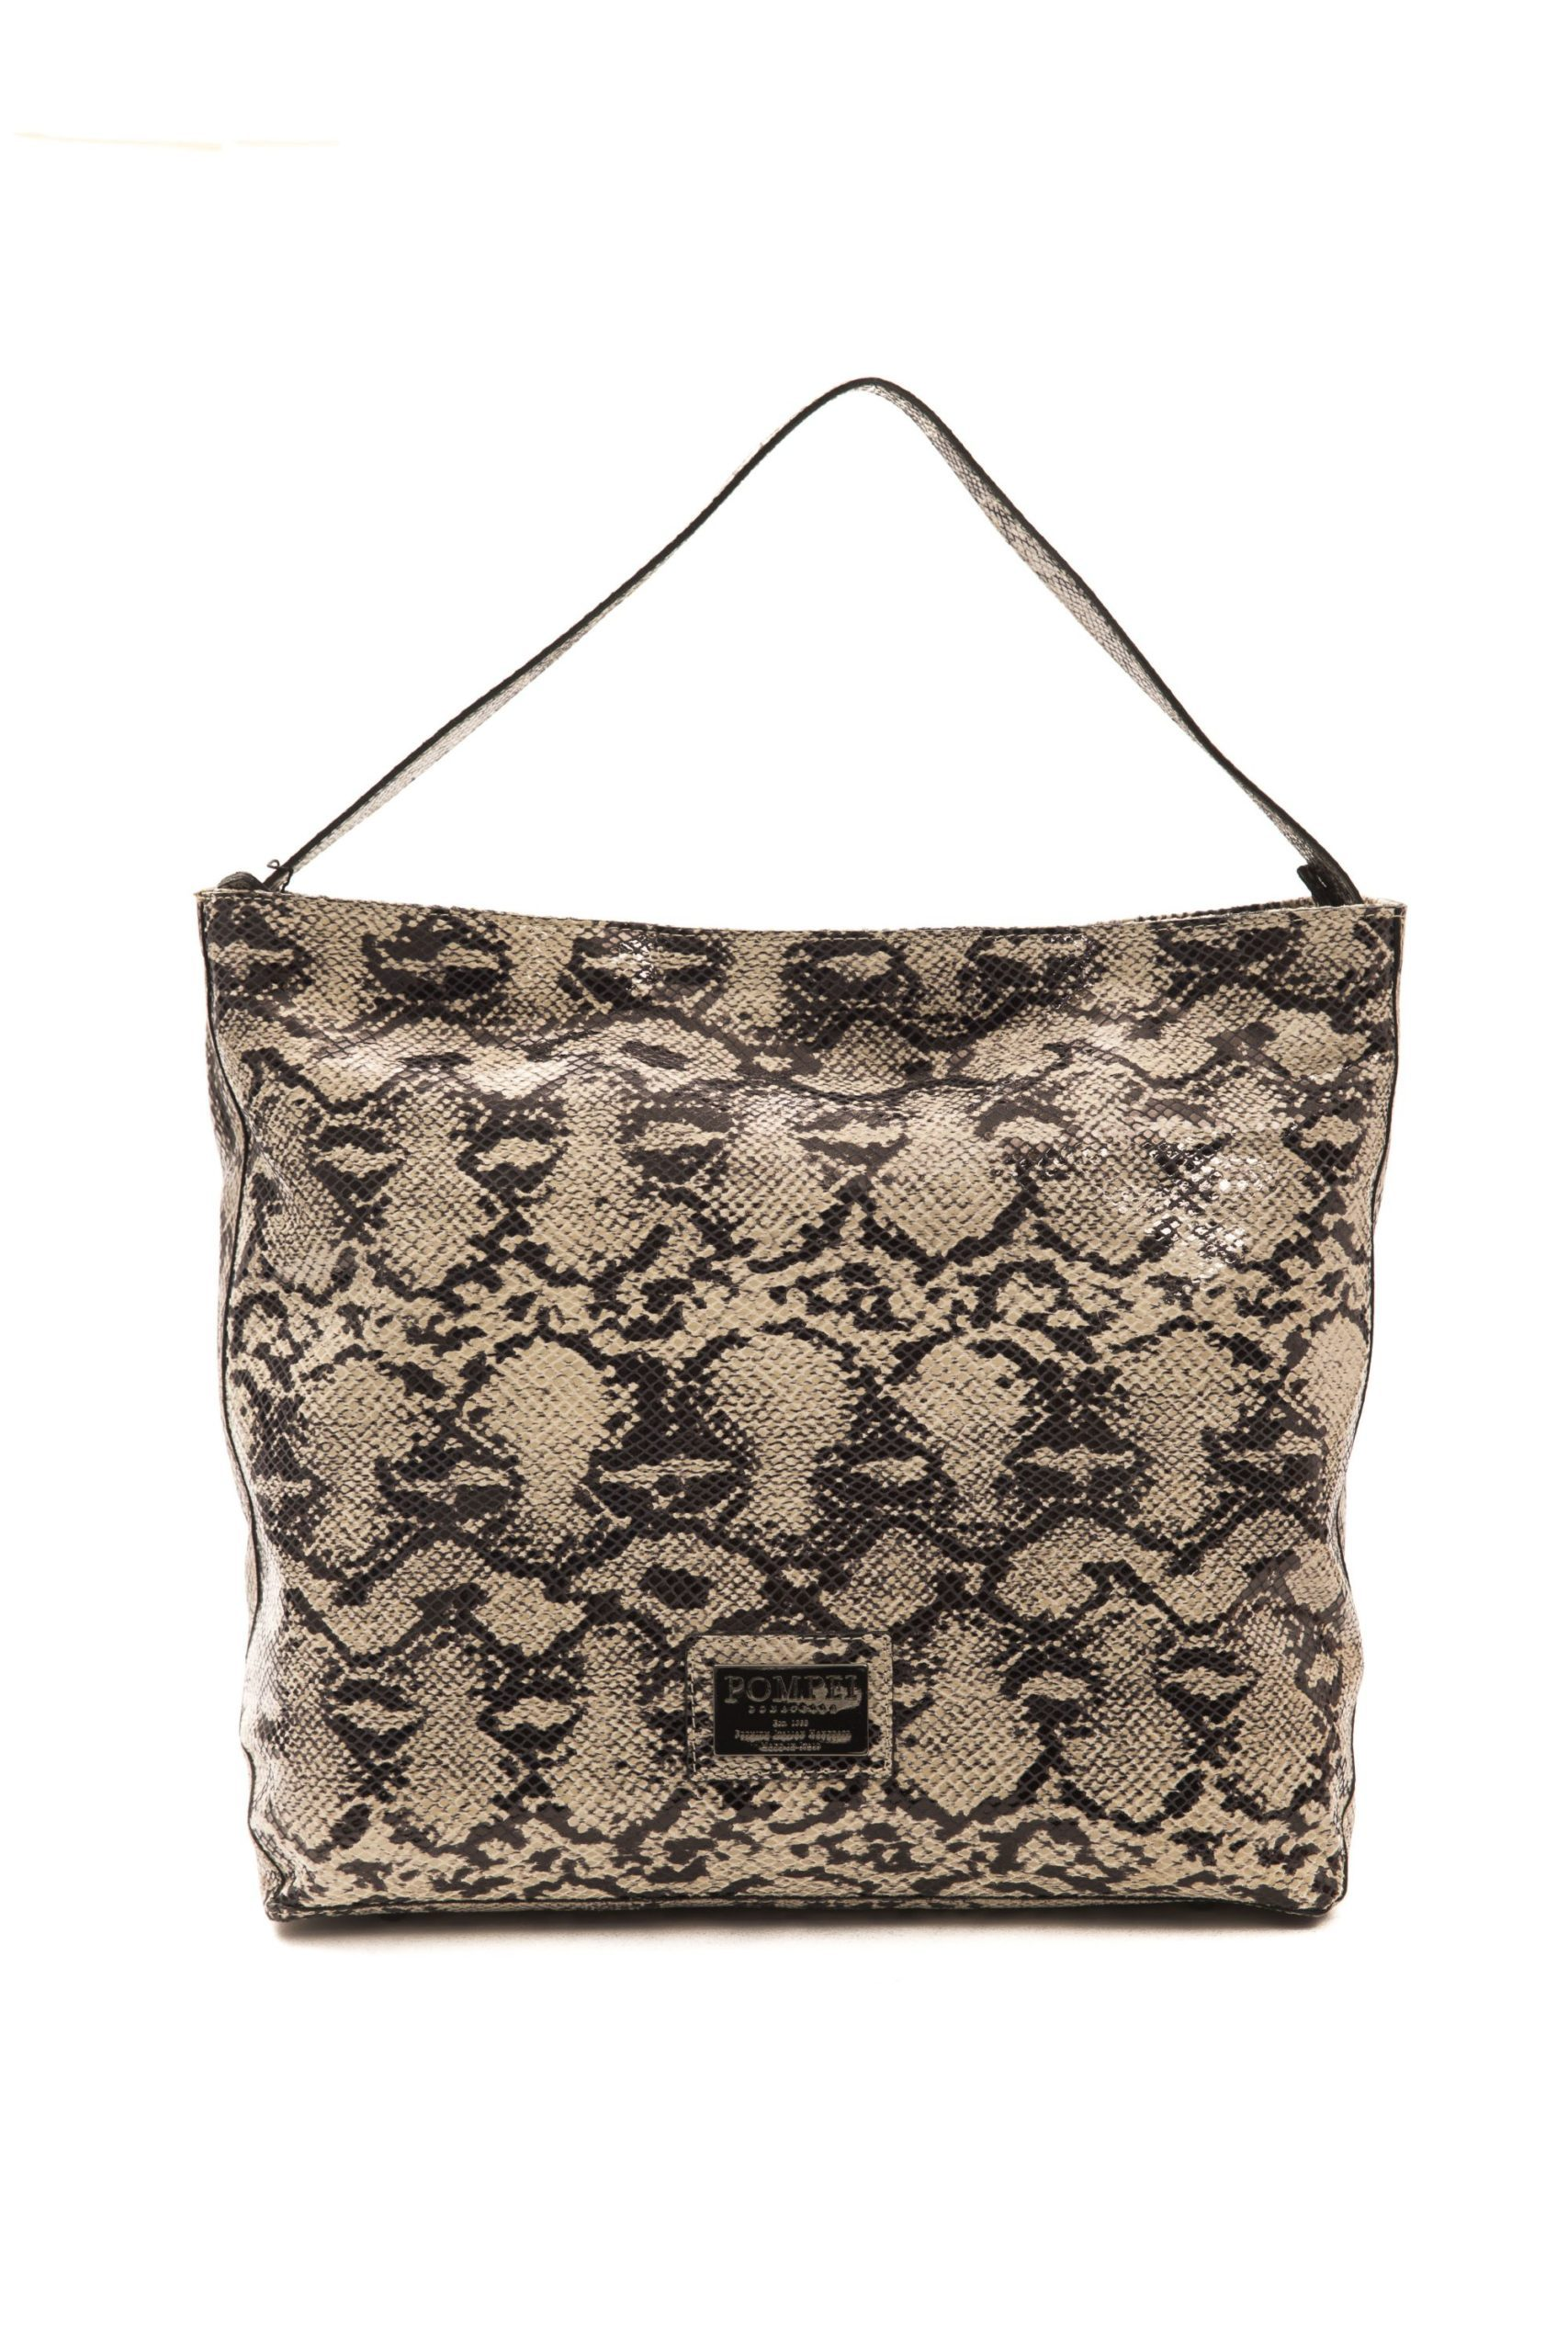 Pompei Donatella Women's Roccia Stone Shoulder Bag Grey PO1004683